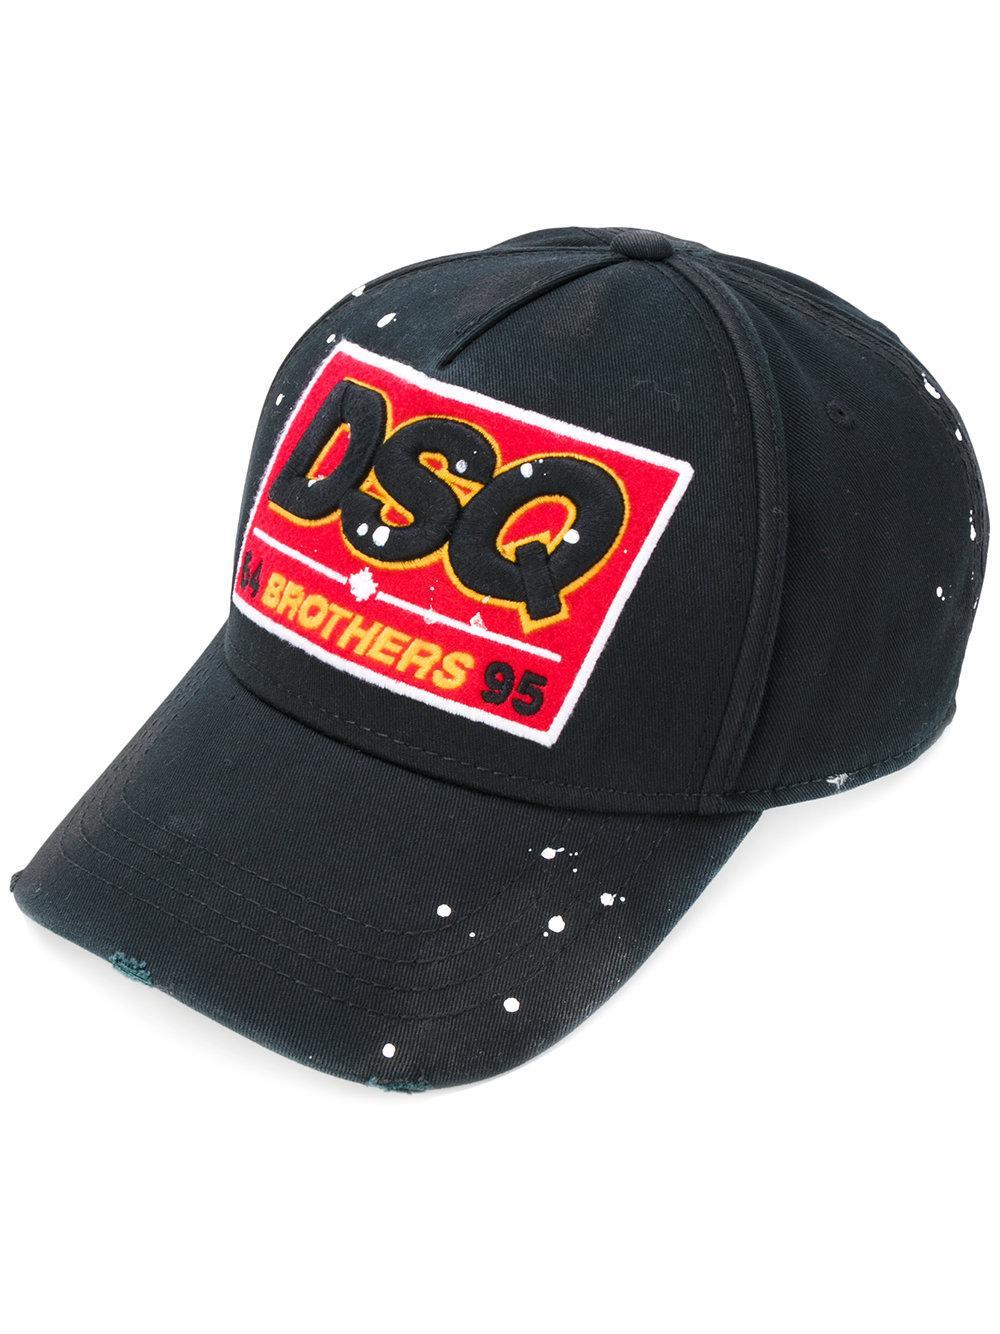 09e674bc2 DSquared² Cotton Dsq Patch Baseball Cap in Black for Men - Lyst